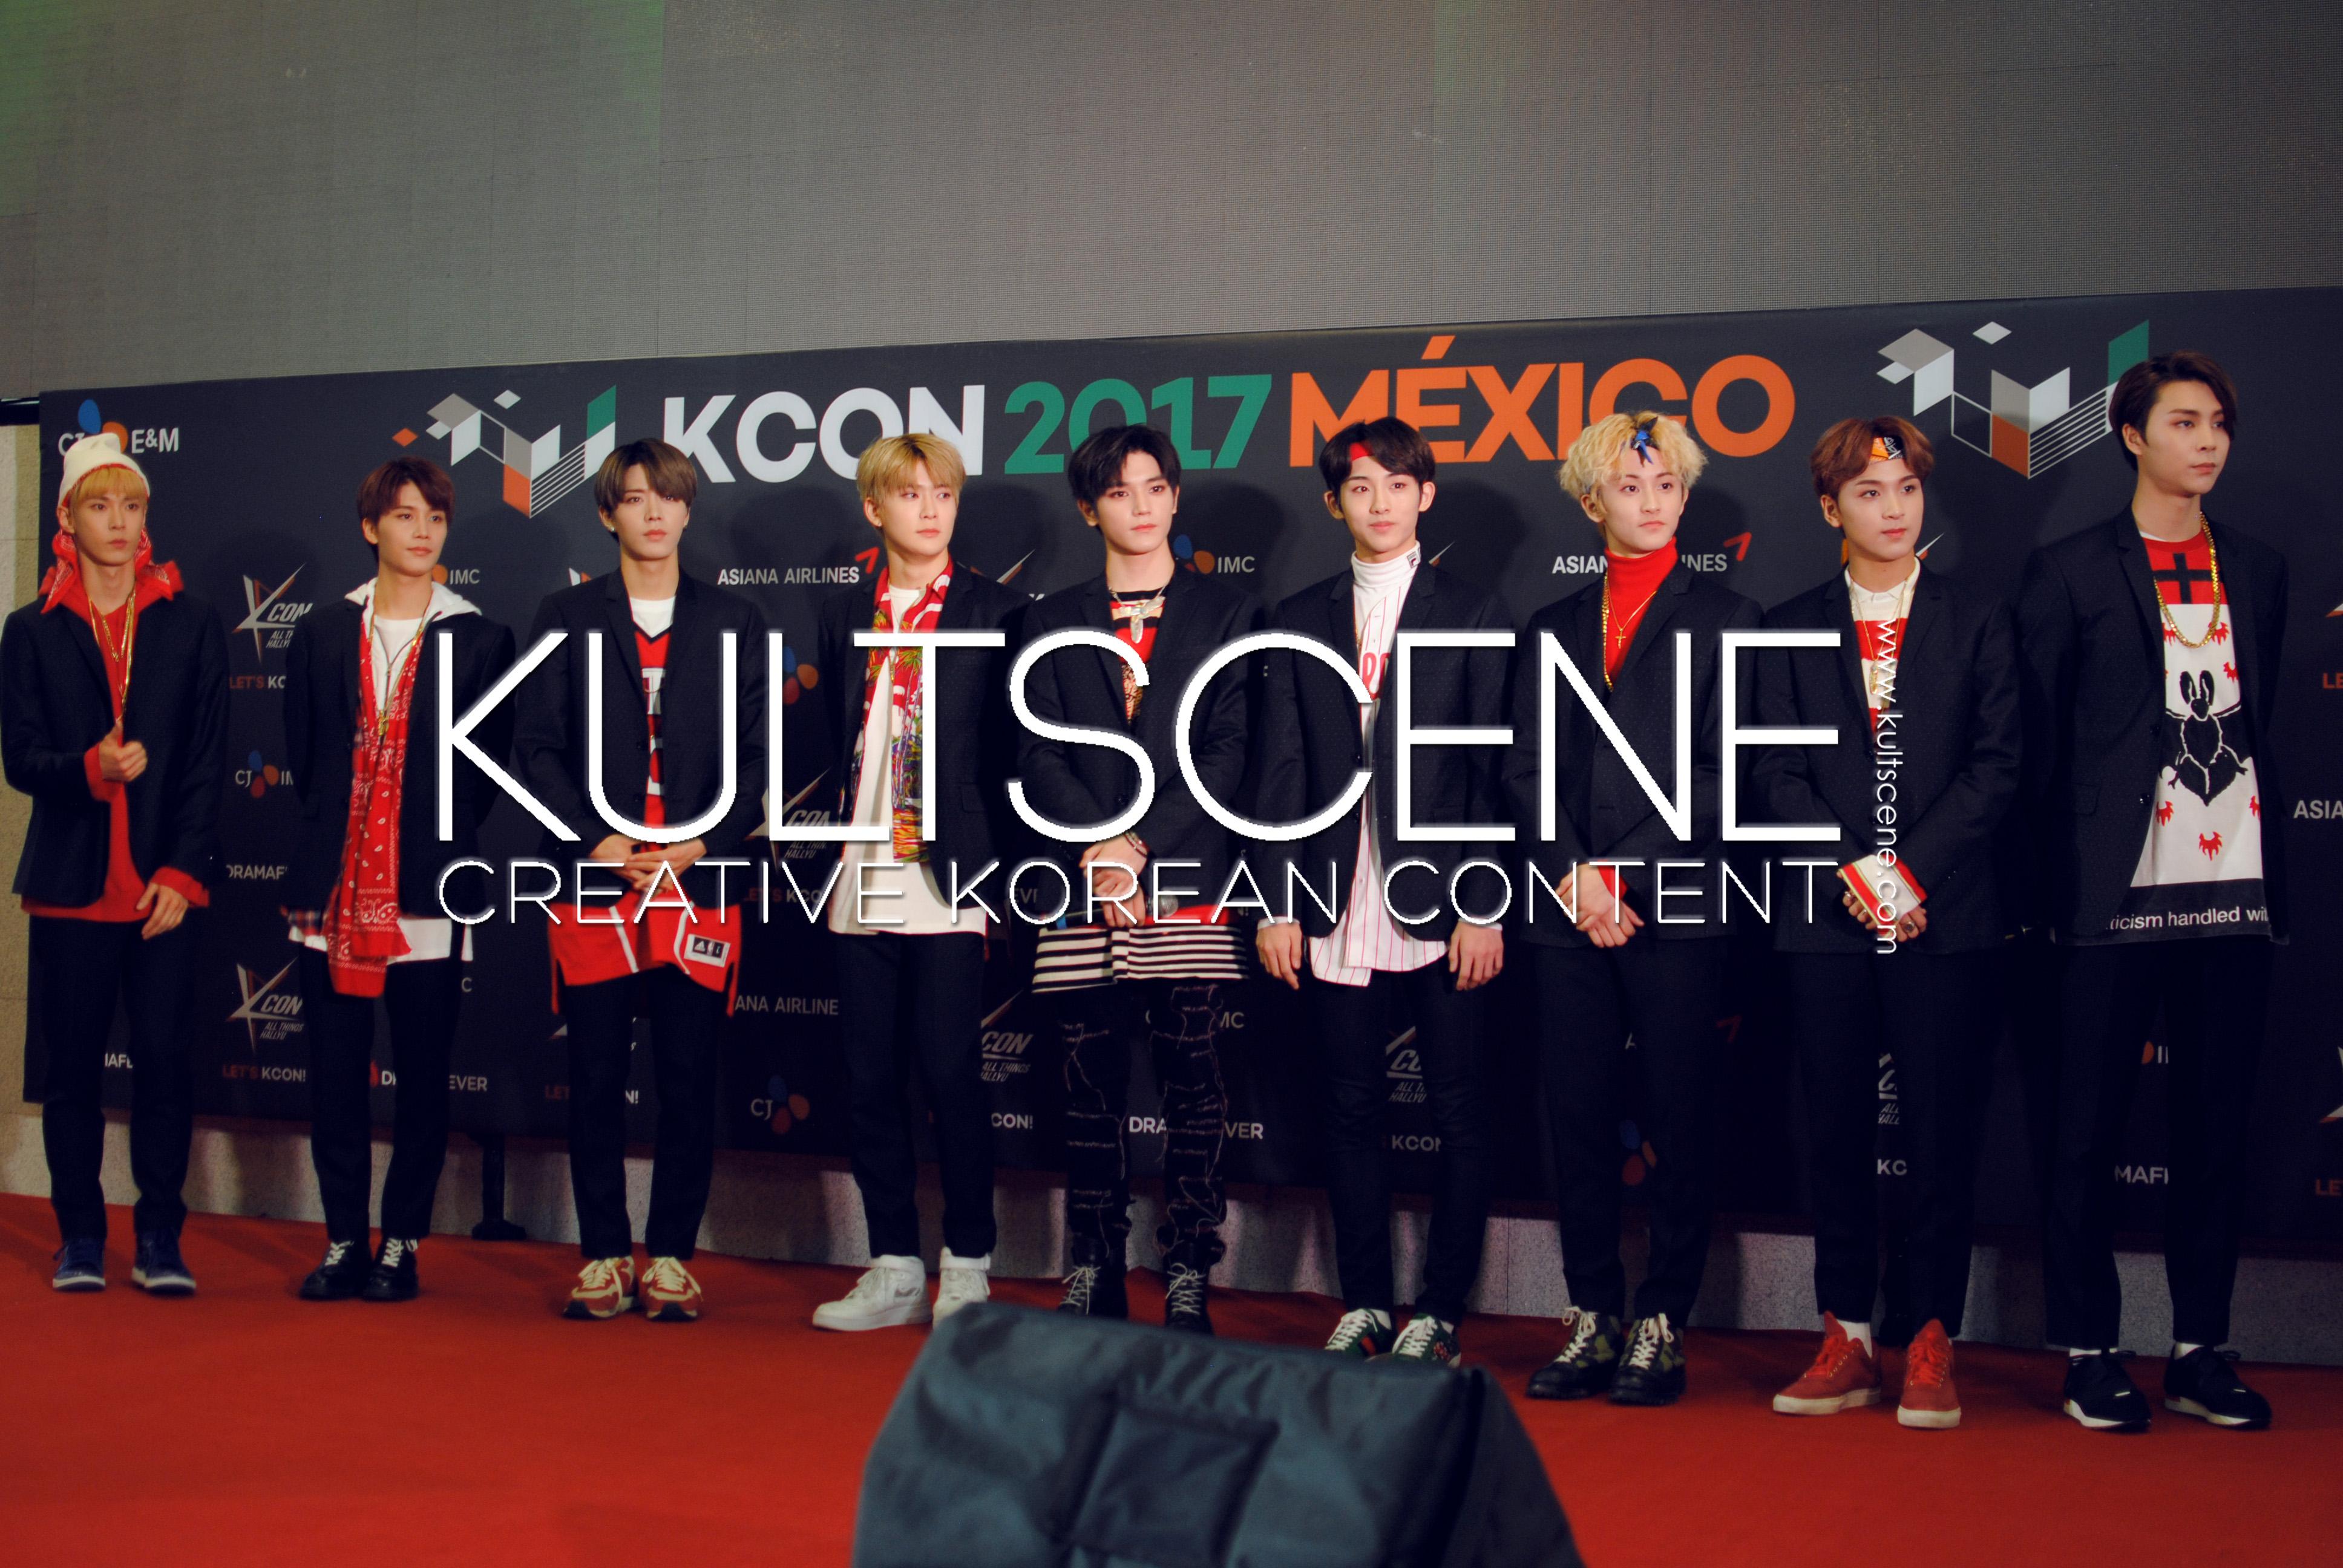 kcon mexico 2017 red carpet nct 127 17 mx kpop